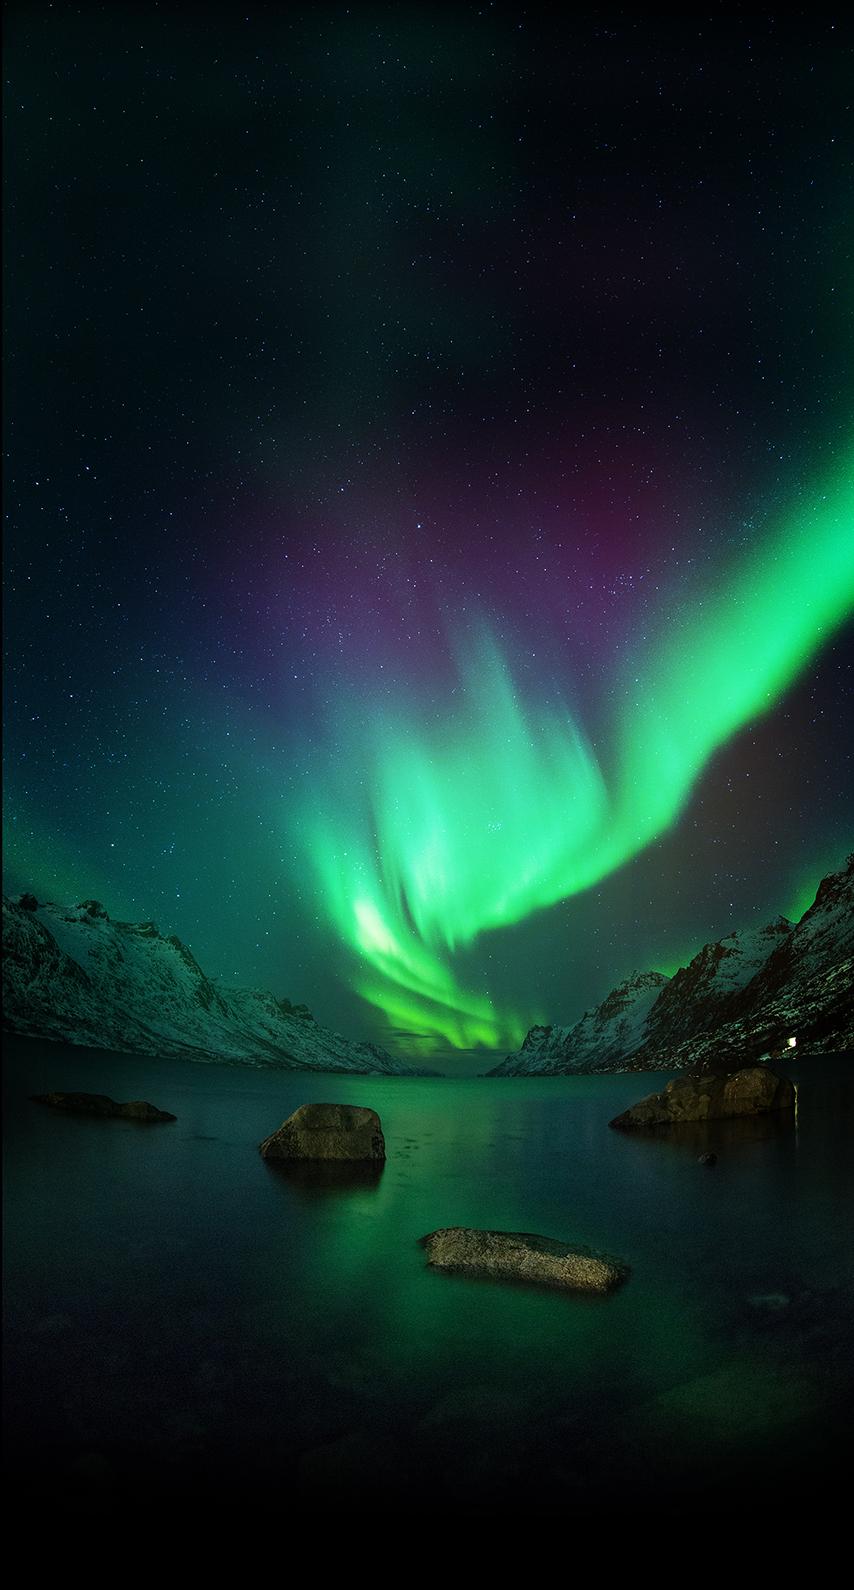 science, astronomy, exploration, surreal, color, reflection, phenomenon